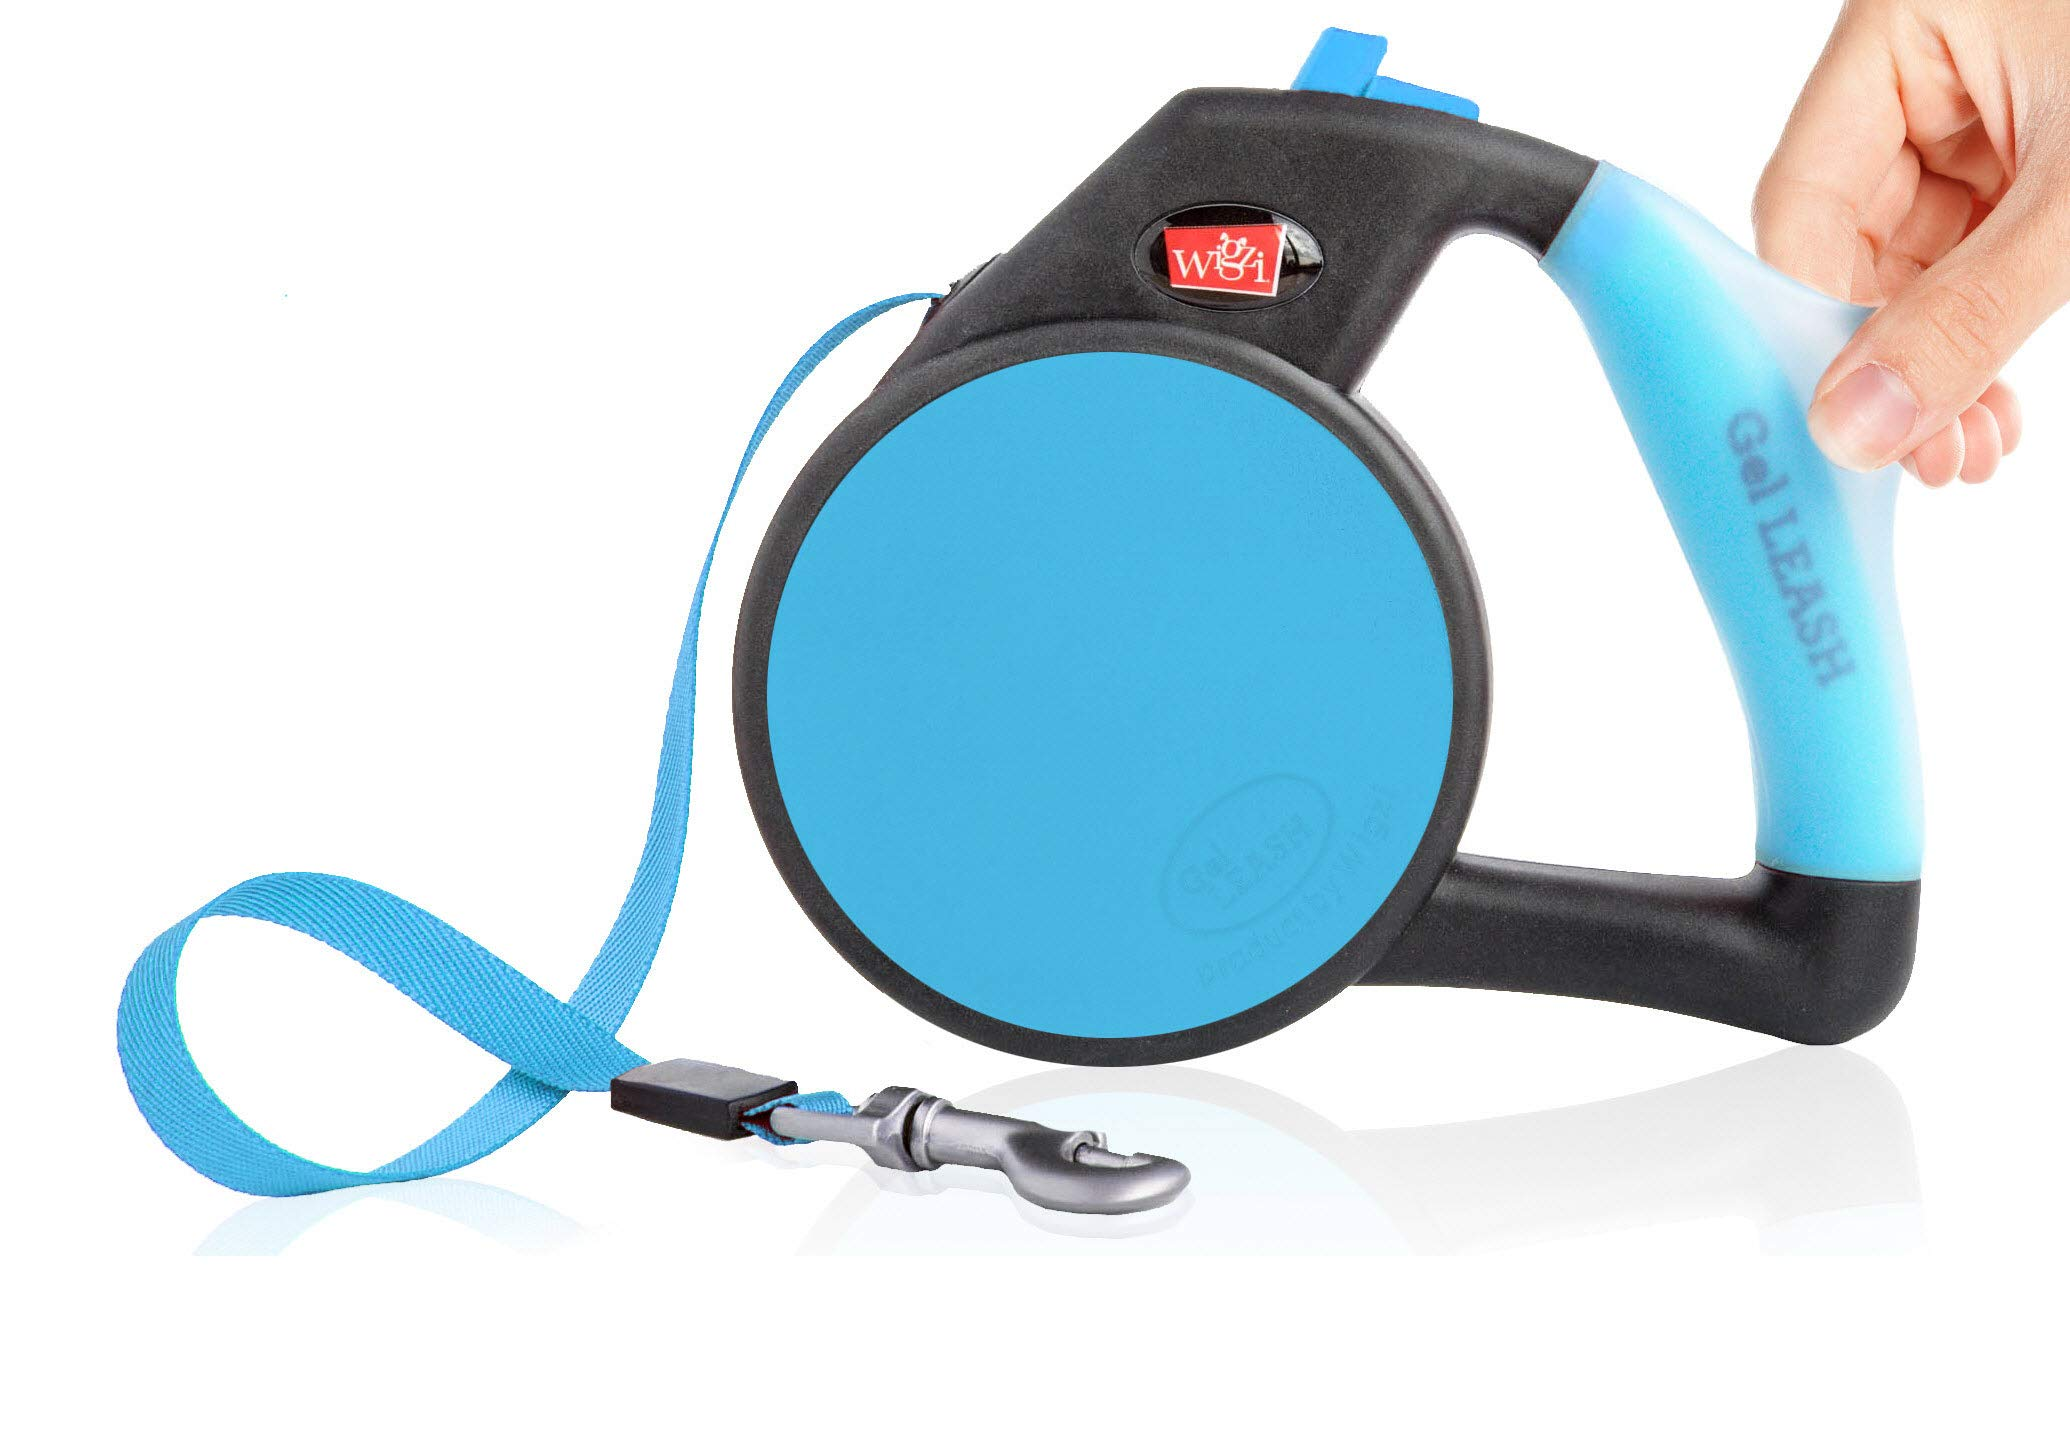 Dog Leash - Retractable Gel Pet Leash - World's Most Comfortable Handle - Blue Large by WIGZI